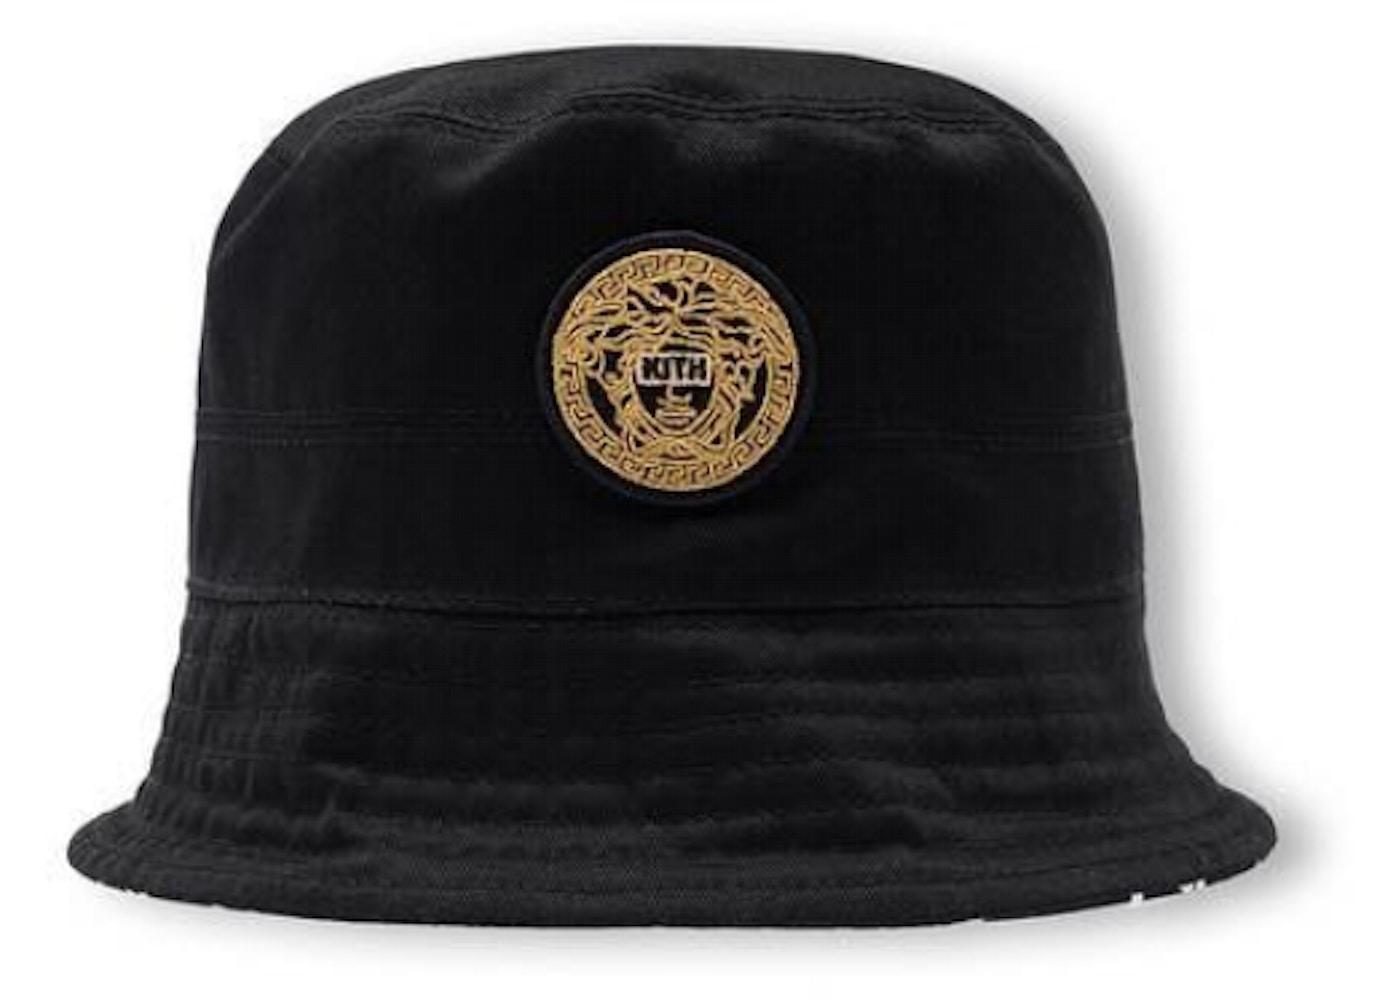 04b21d516acda Kith x Versace Reversible Bucket Hat Black - SS19